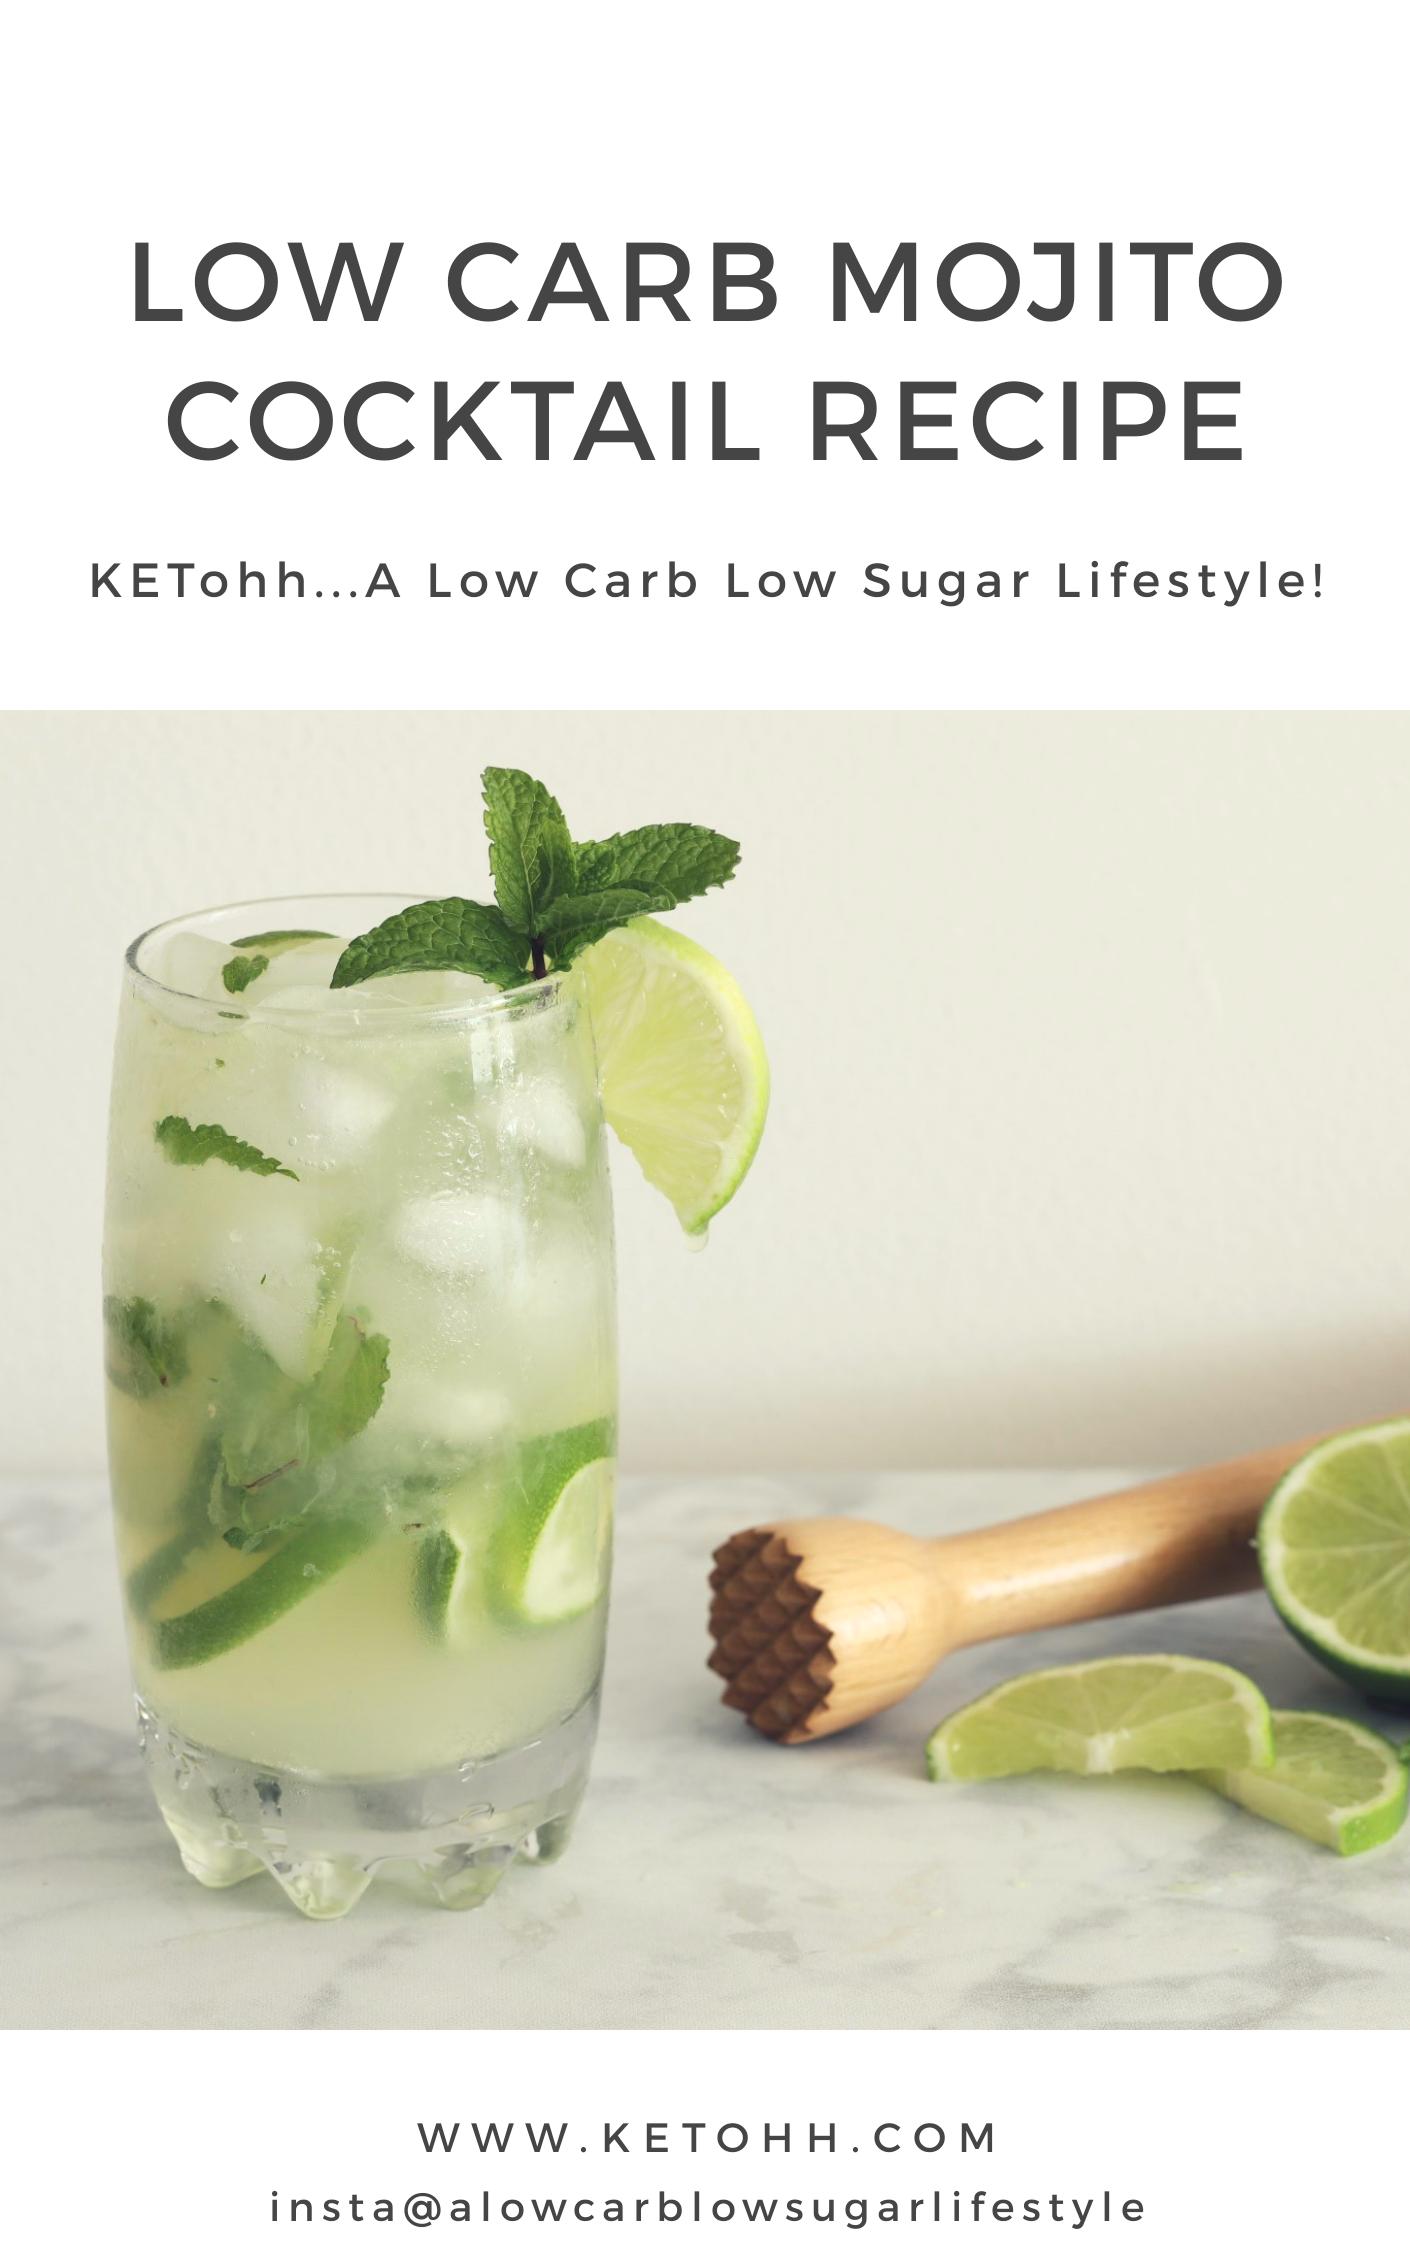 Low Carb Mojito Cocktail Recipe Ketohh Sugar Free Lchf Keto Recipe Recipe Low Carb Cocktails Low Carb Mojito Cocktail Recipe